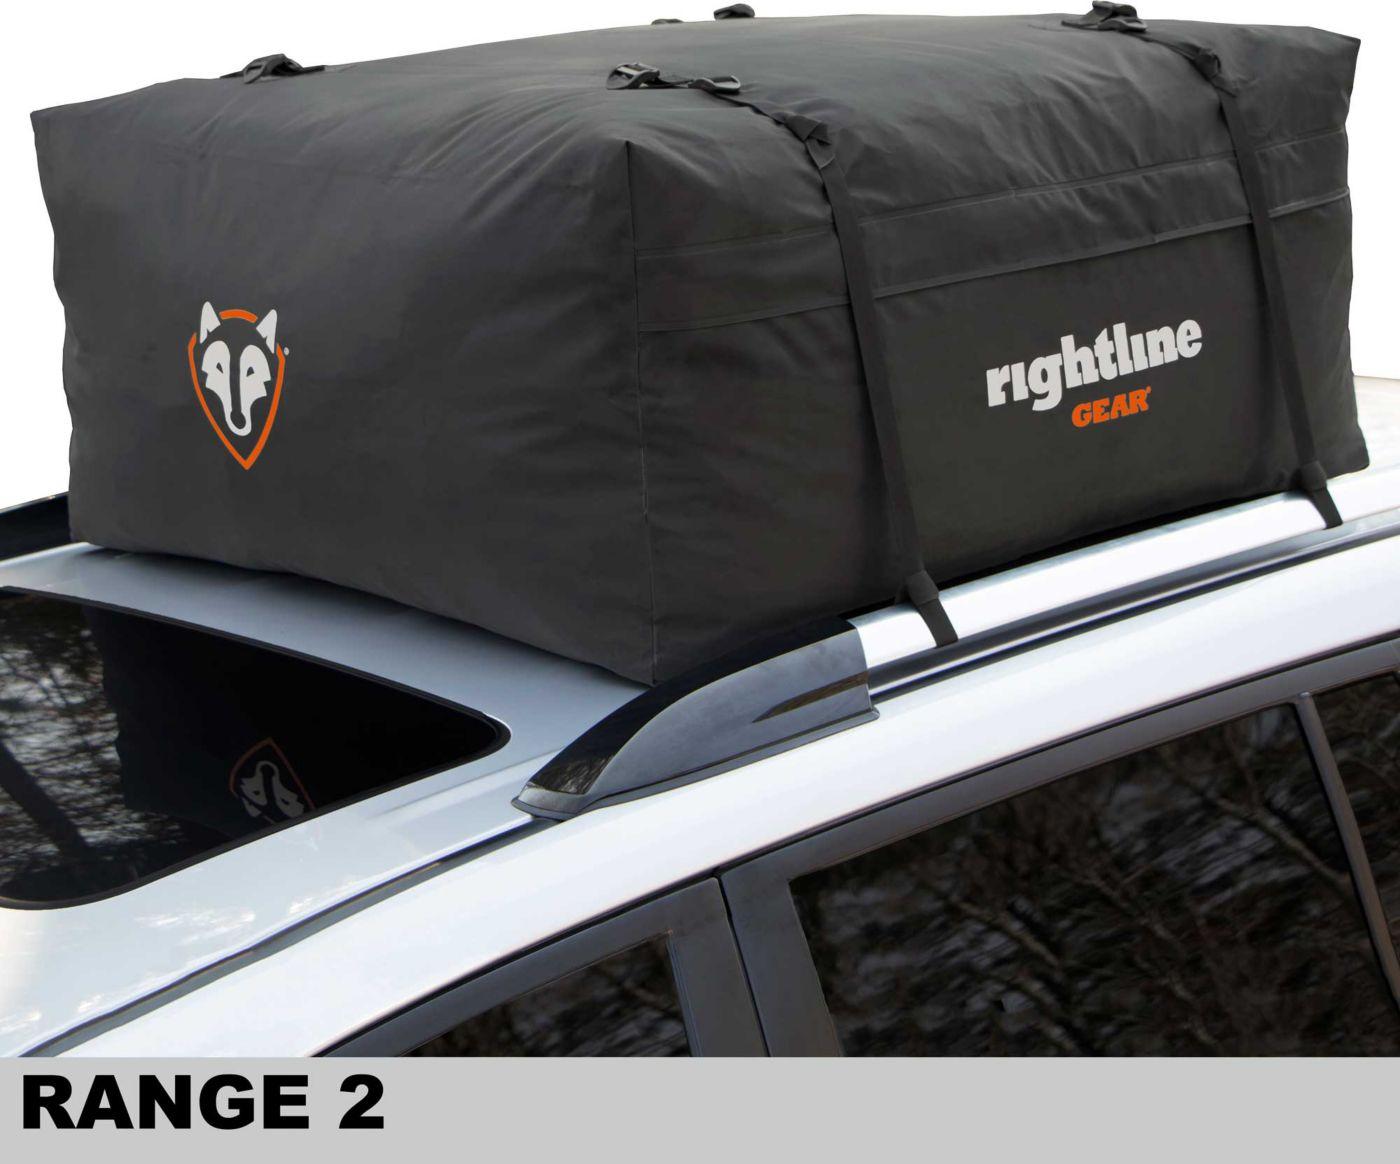 Rightline Gear Range Car Top Carrier